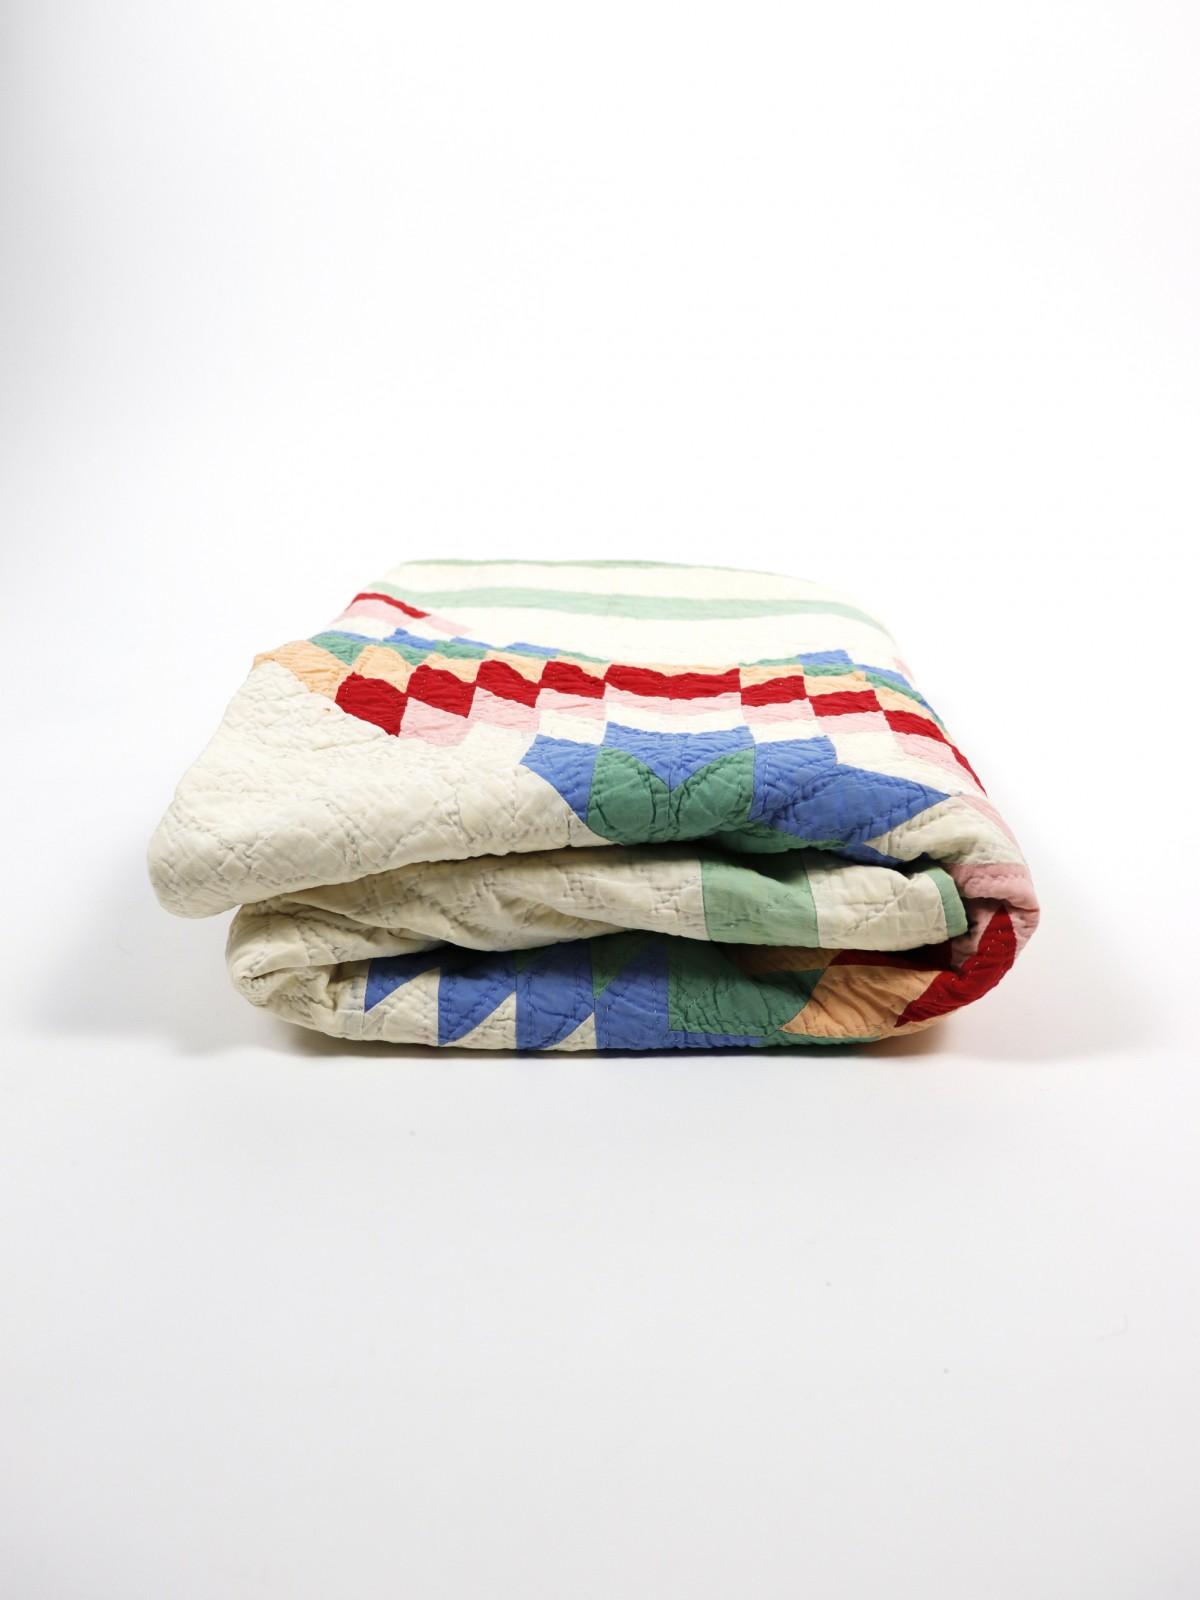 Antique, Handmade quilt, 1900's, USA, BROWN.